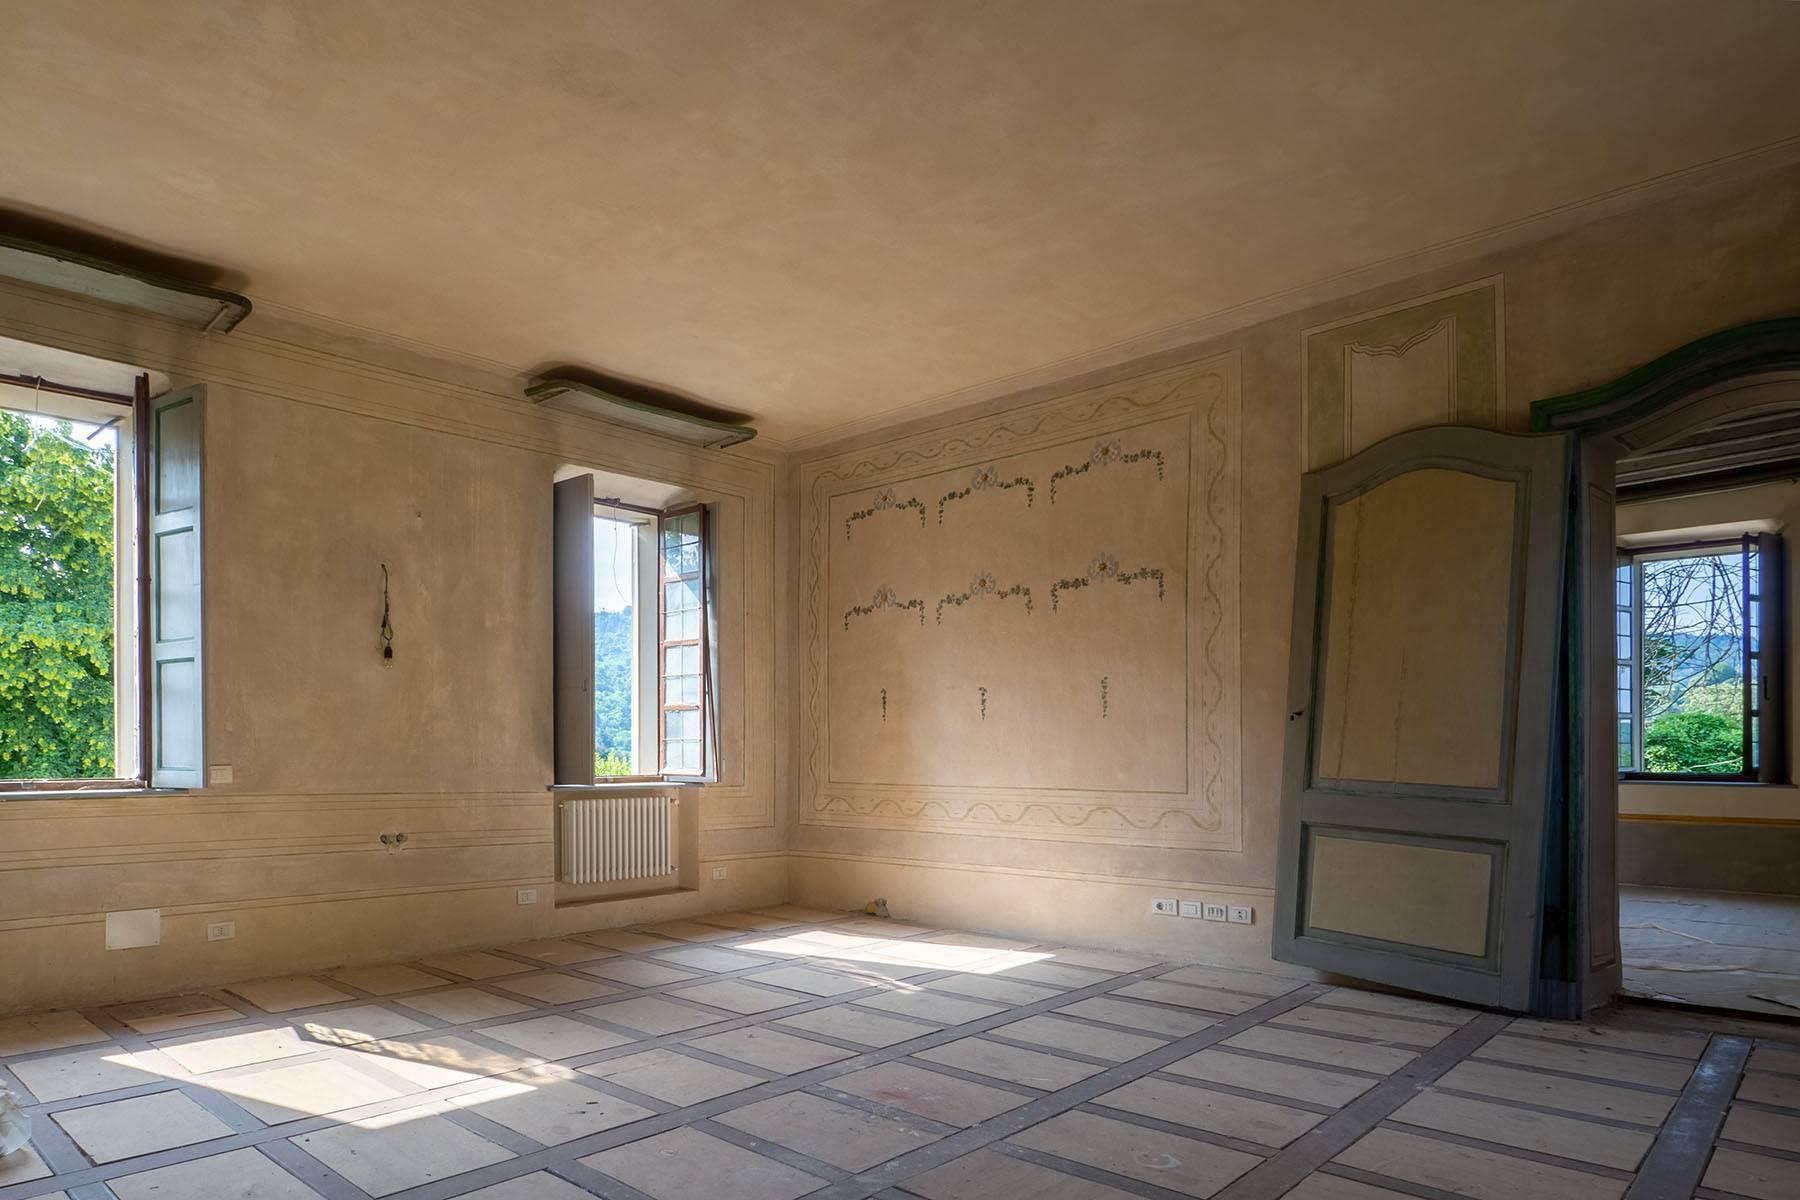 Casa indipendente in Vendita a Torino: 5 locali, 400 mq - Foto 7